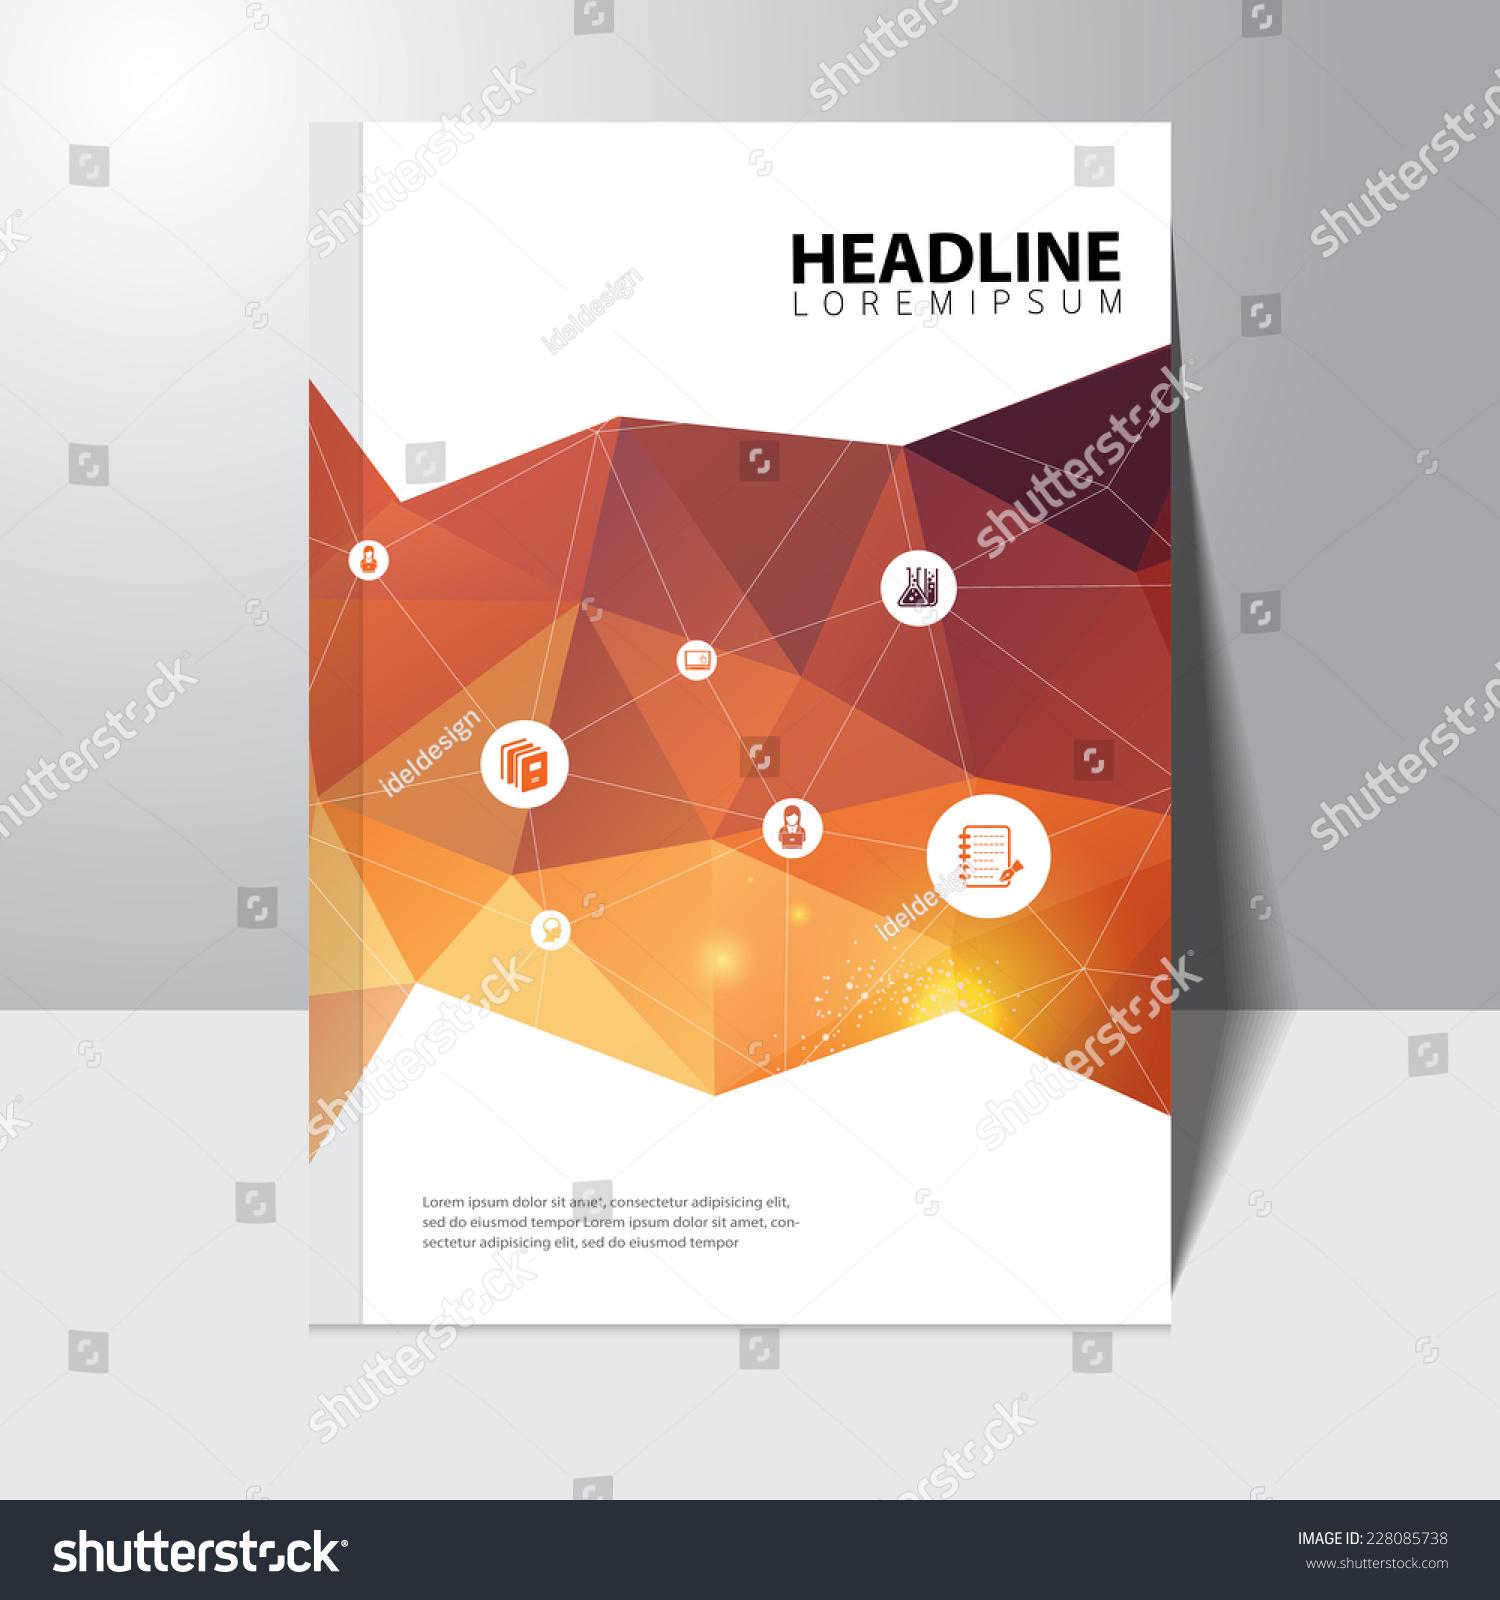 Book Cover Design Education ~ Vector education book cover design template stock